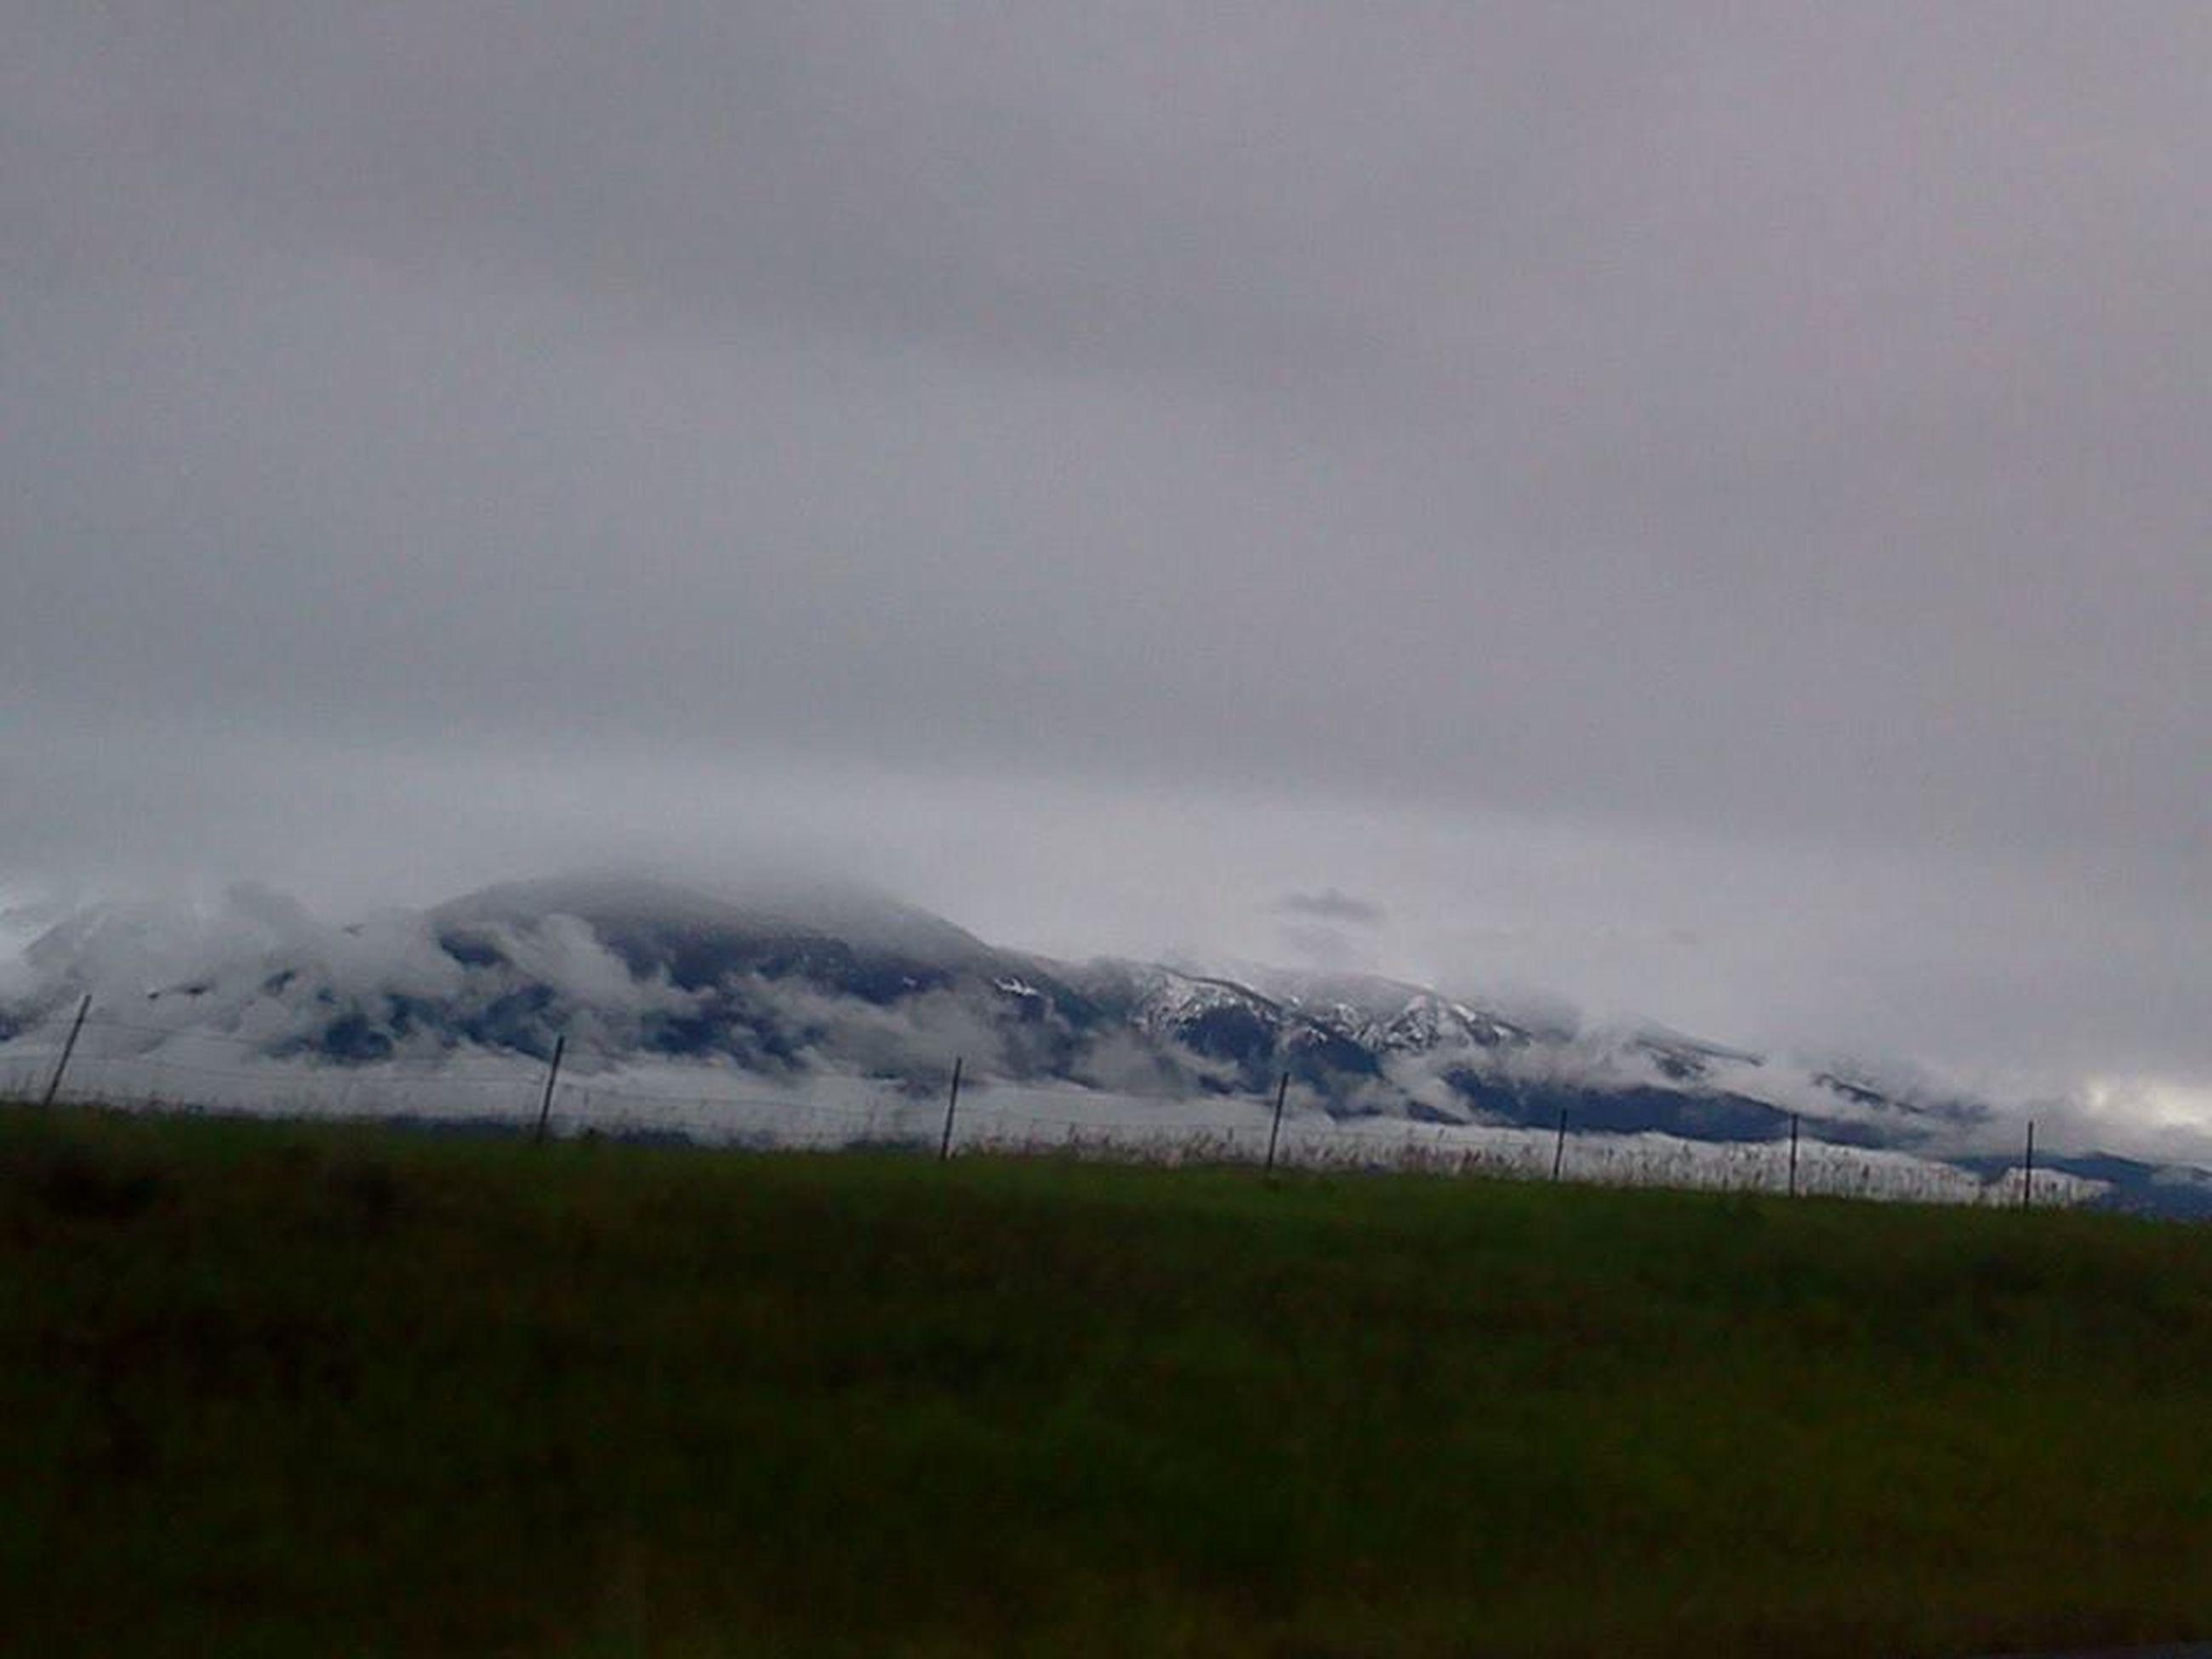 landscape, mountain, tranquil scene, tranquility, scenics, weather, winter, sky, beauty in nature, cold temperature, snow, nature, field, grass, mountain range, cloud - sky, non-urban scene, cloudy, season, idyllic